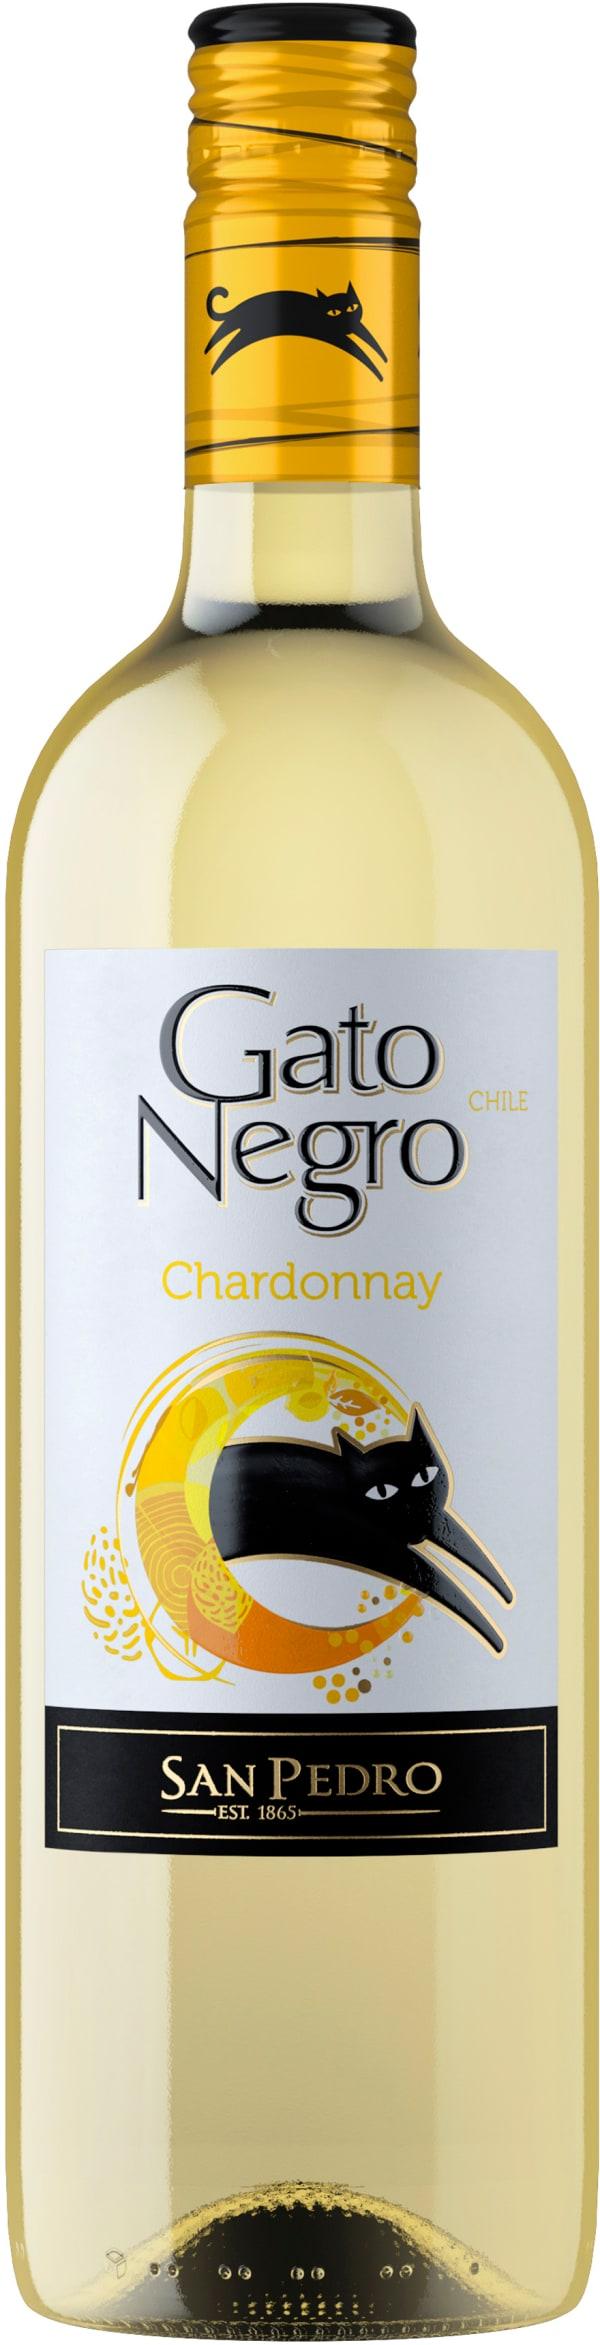 Gato Negro Chardonnay 2019